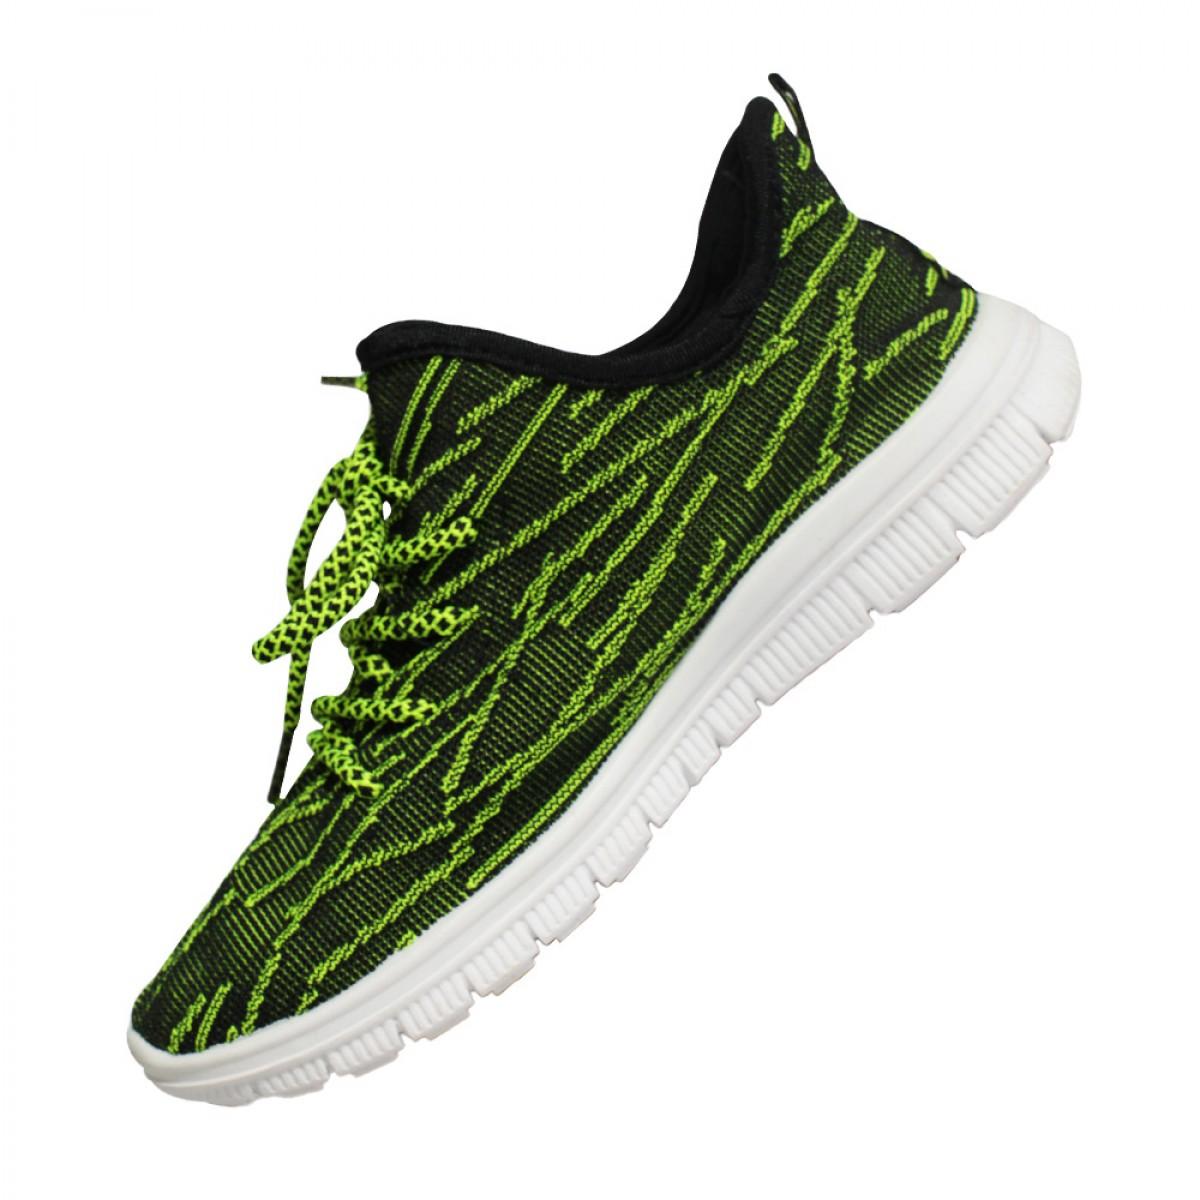 shoes-kf81507-6